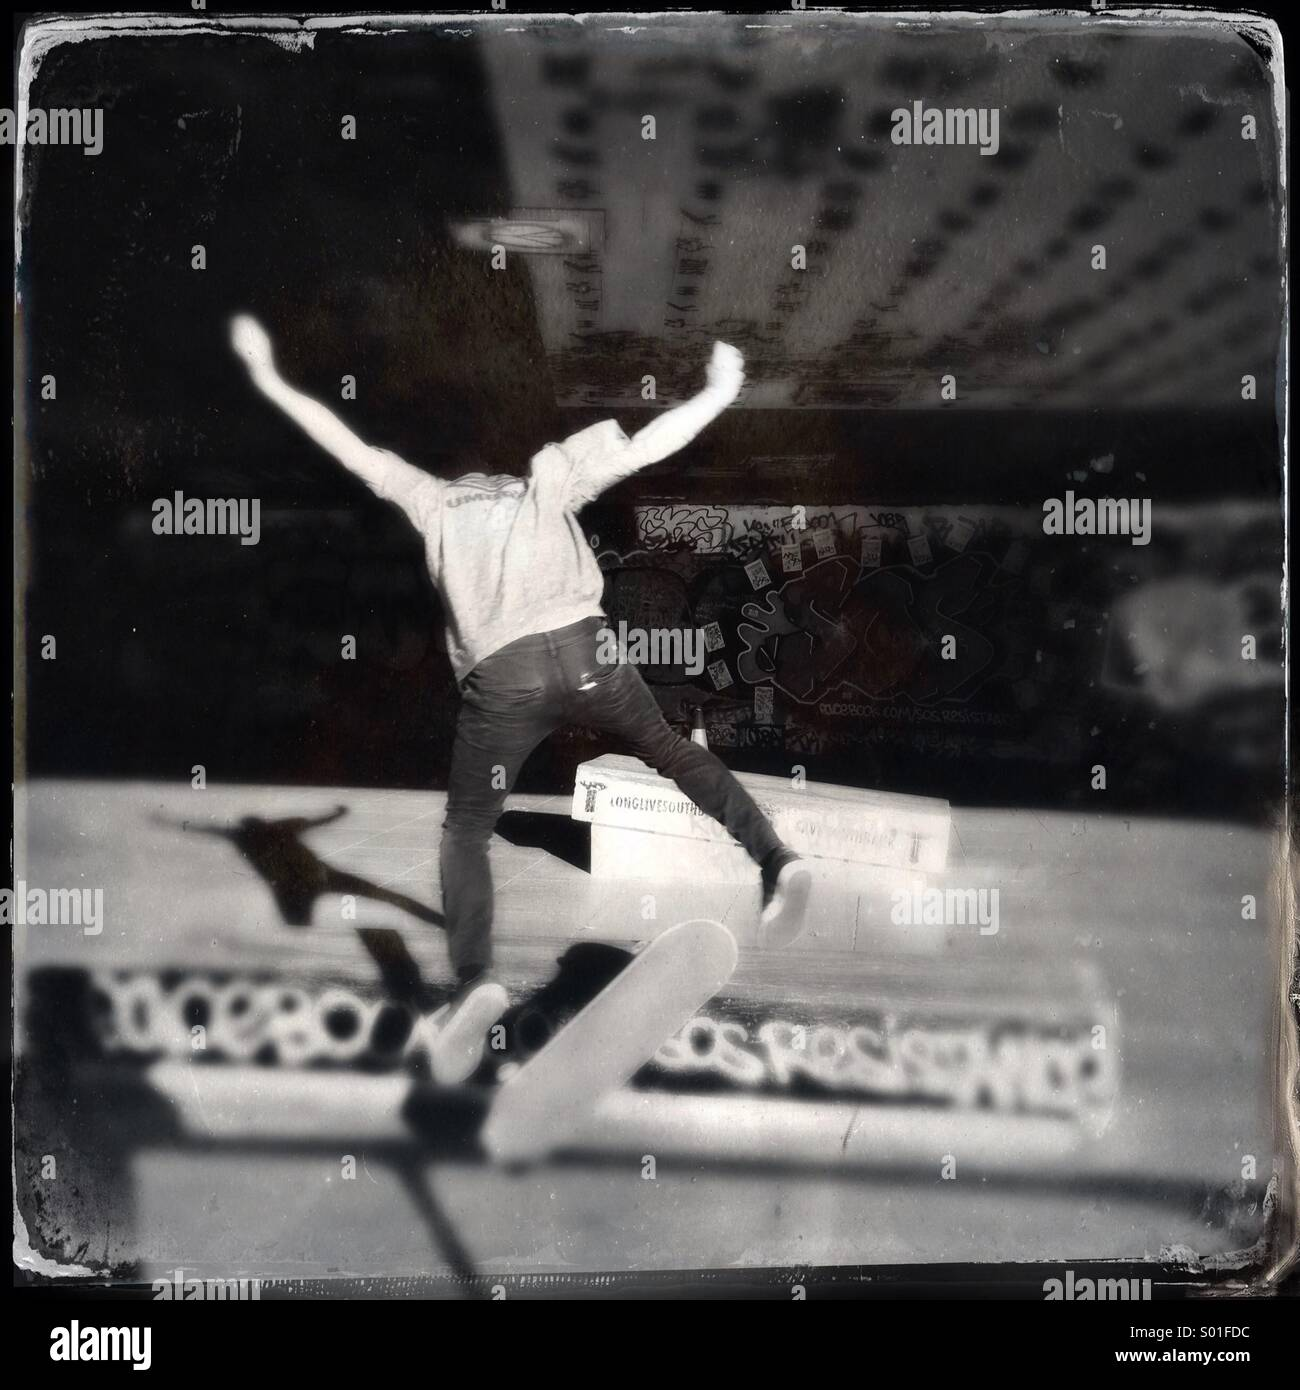 Skateur Photo Stock